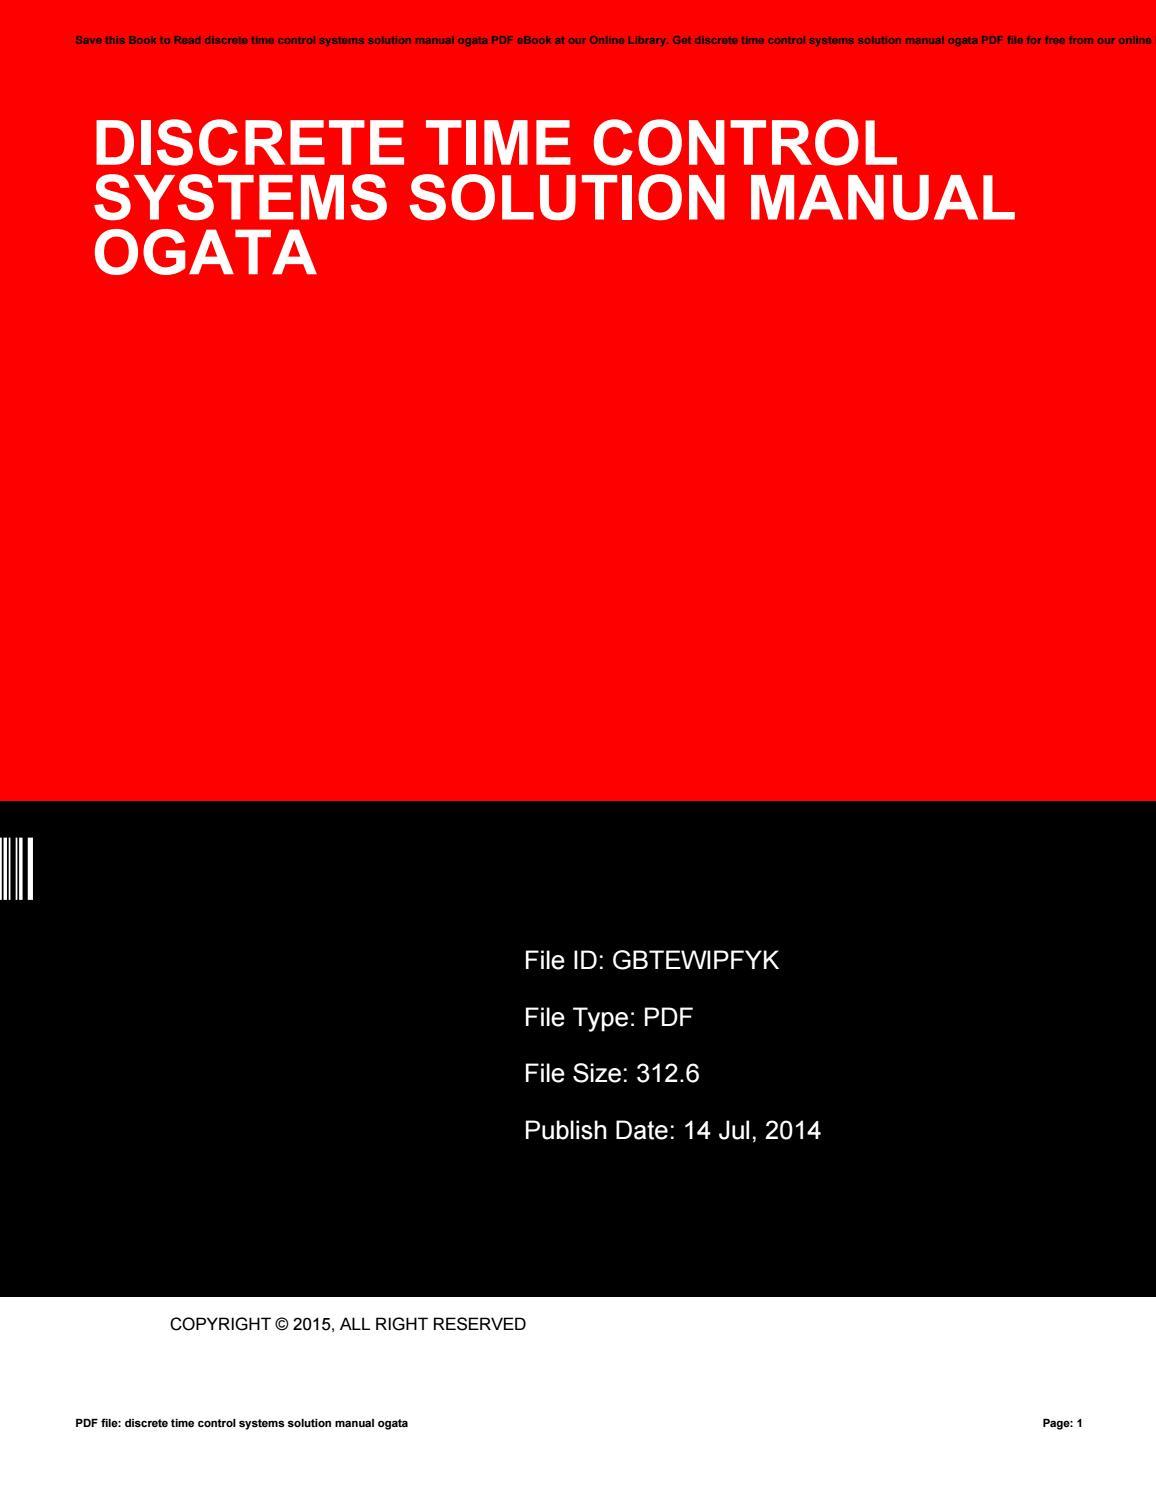 Discrete time control systems solution manual ogata by FreddieSmith2570 -  issuu